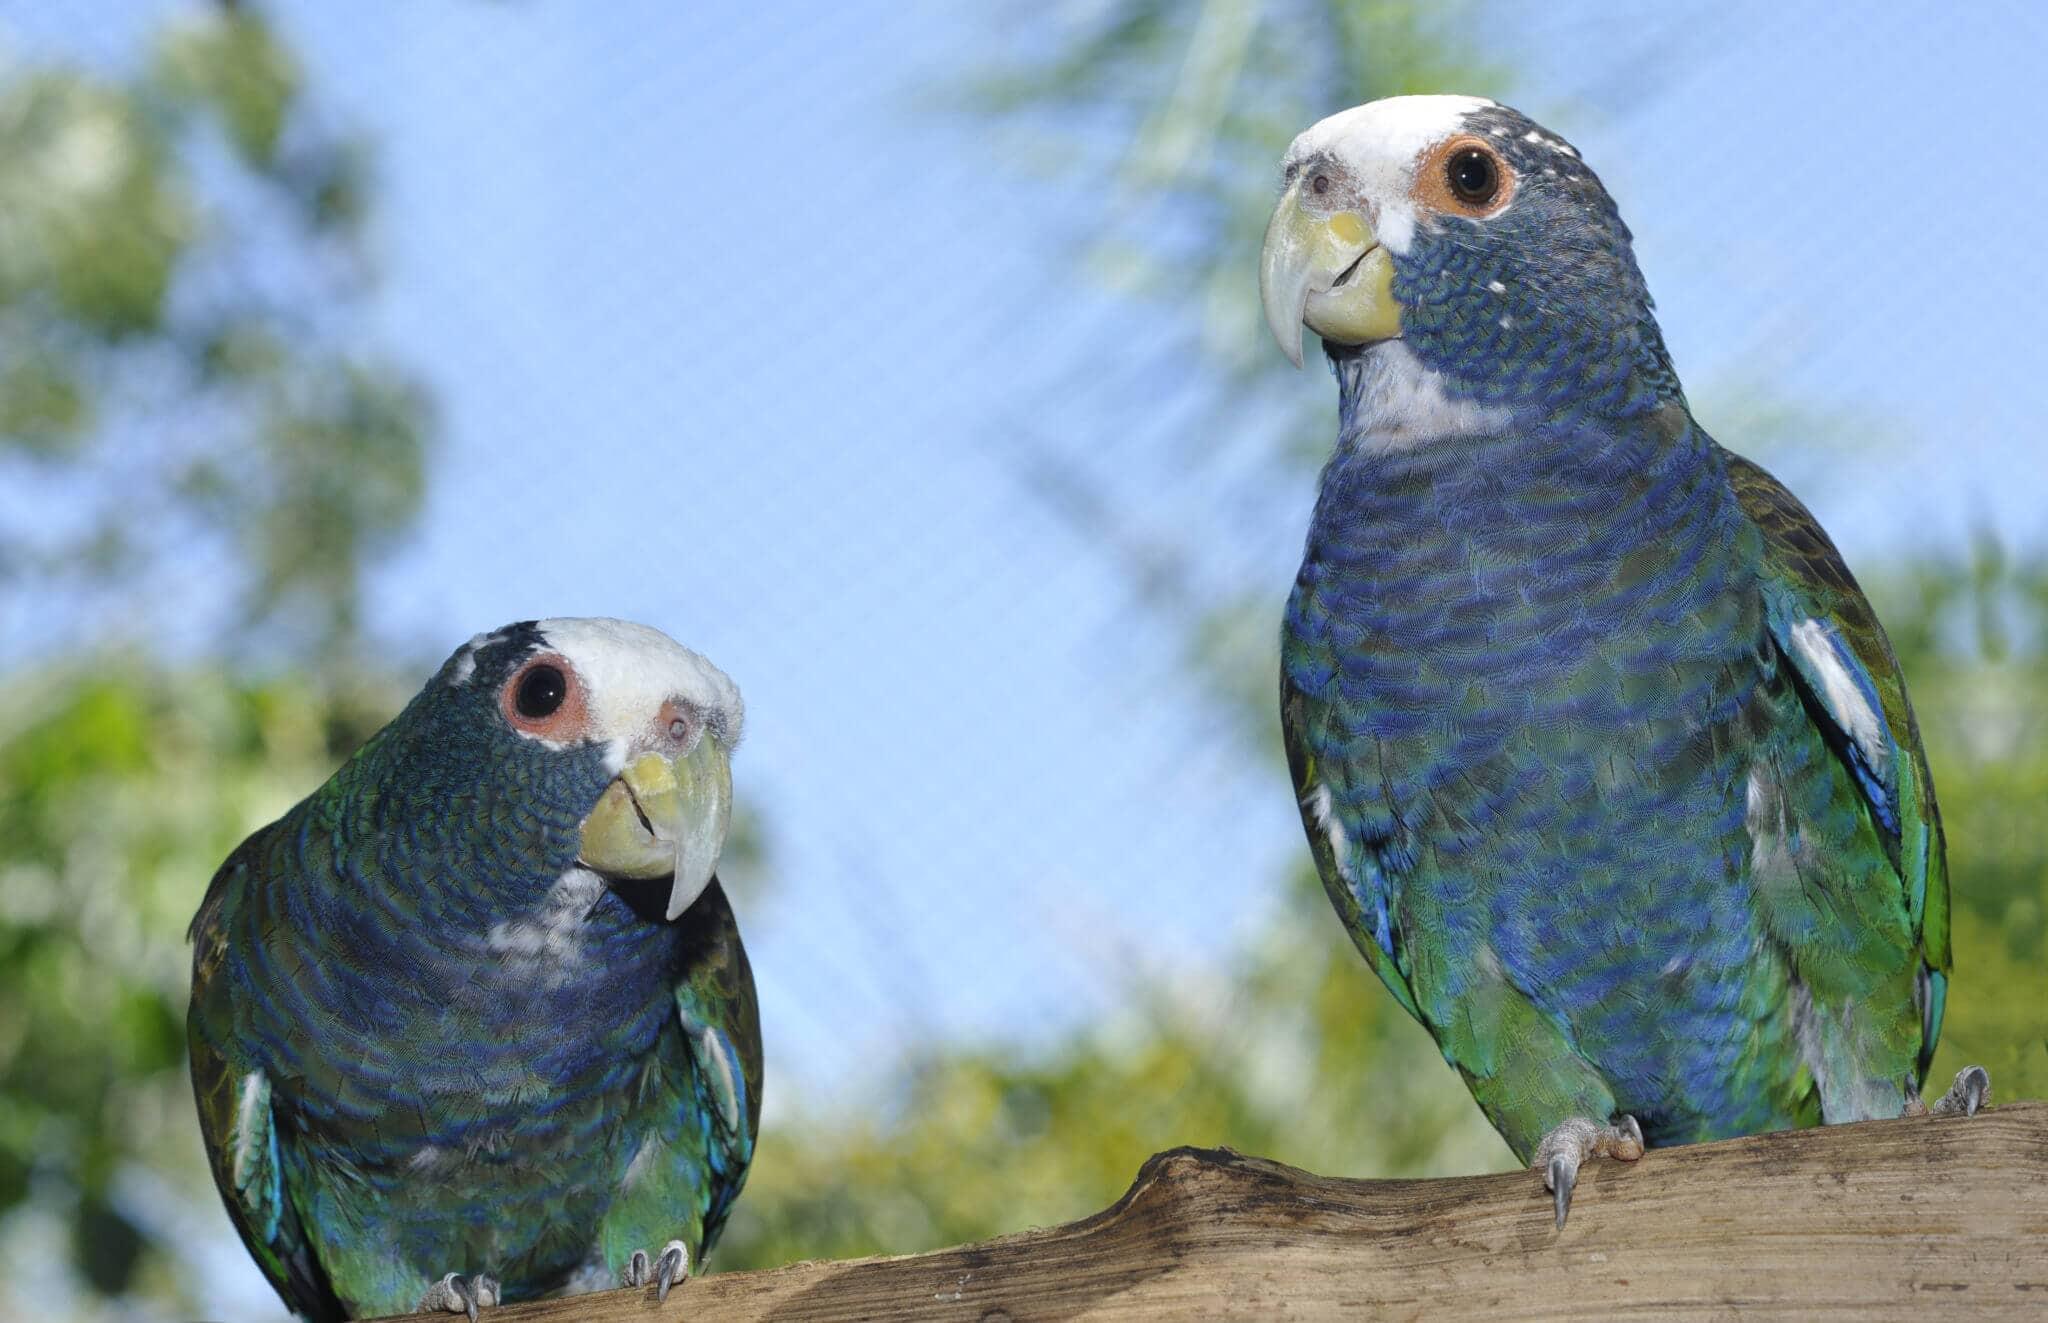 White cap parrot